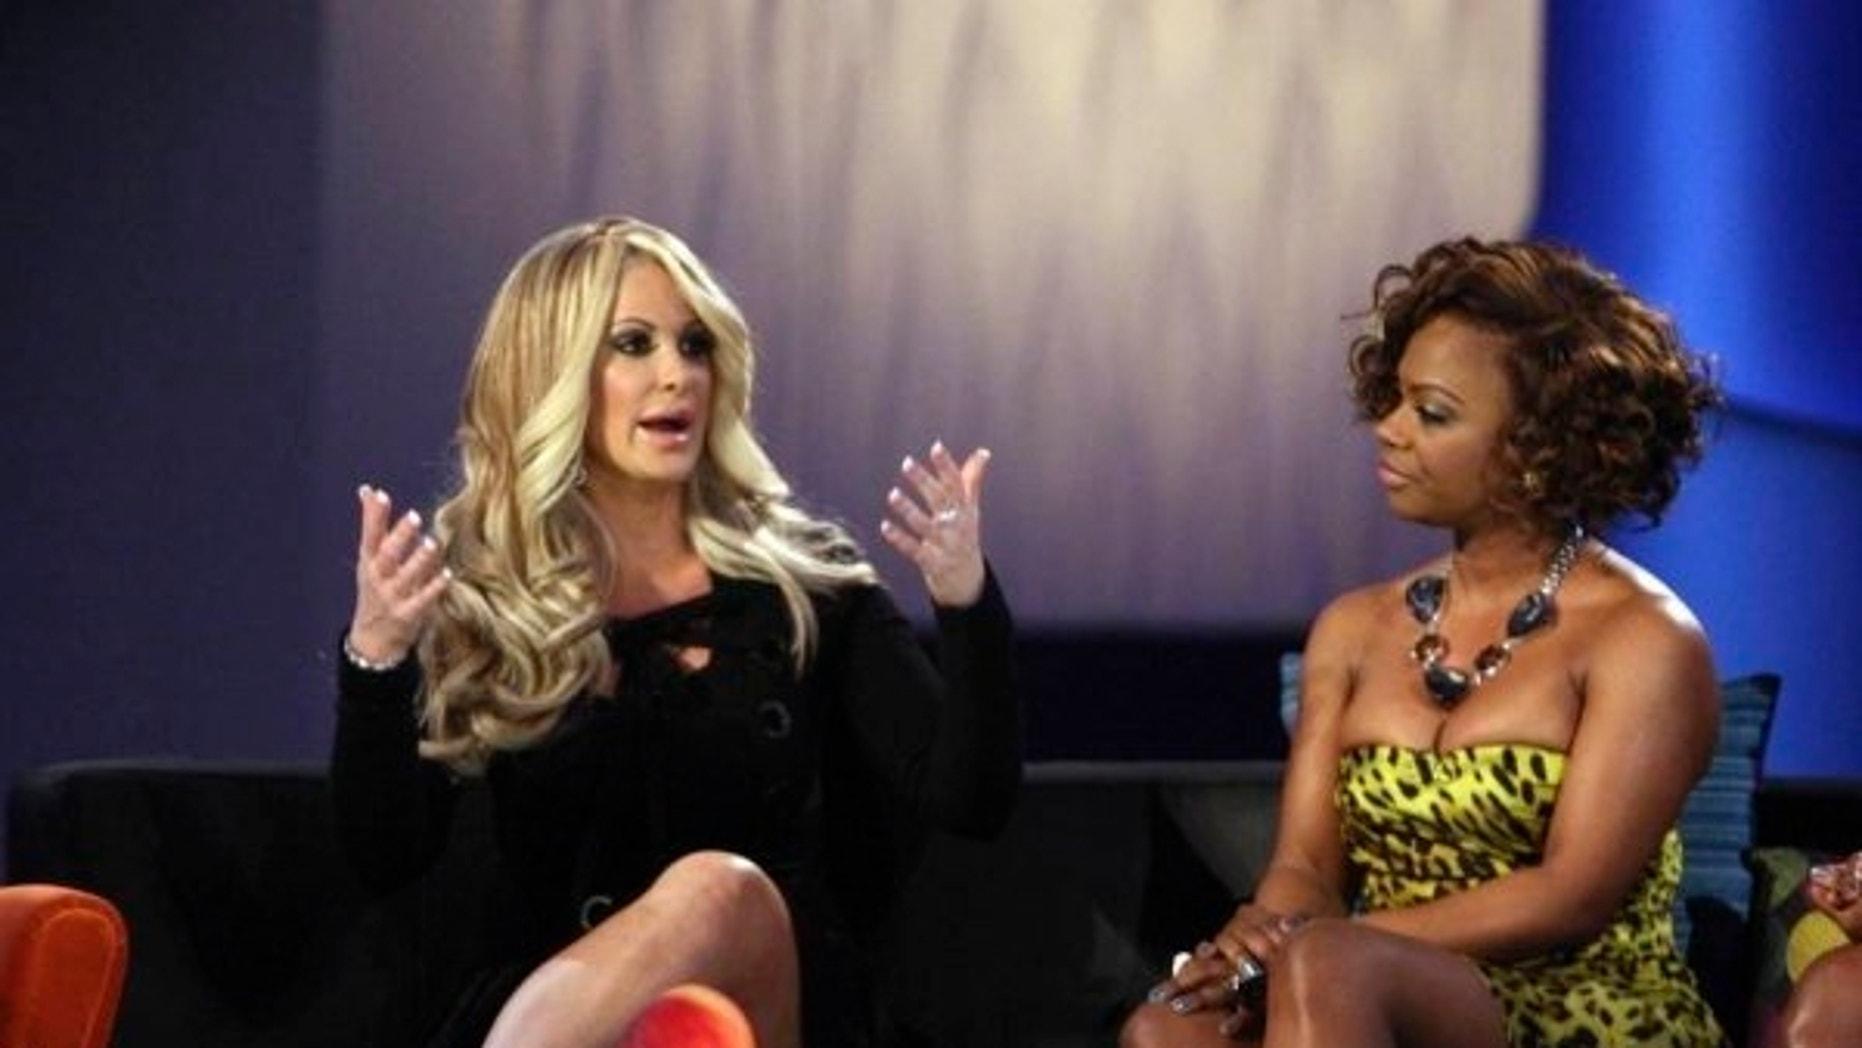 'Real Housewives of Atlanta' stars Kim Zolciak and Kandi Burruss.